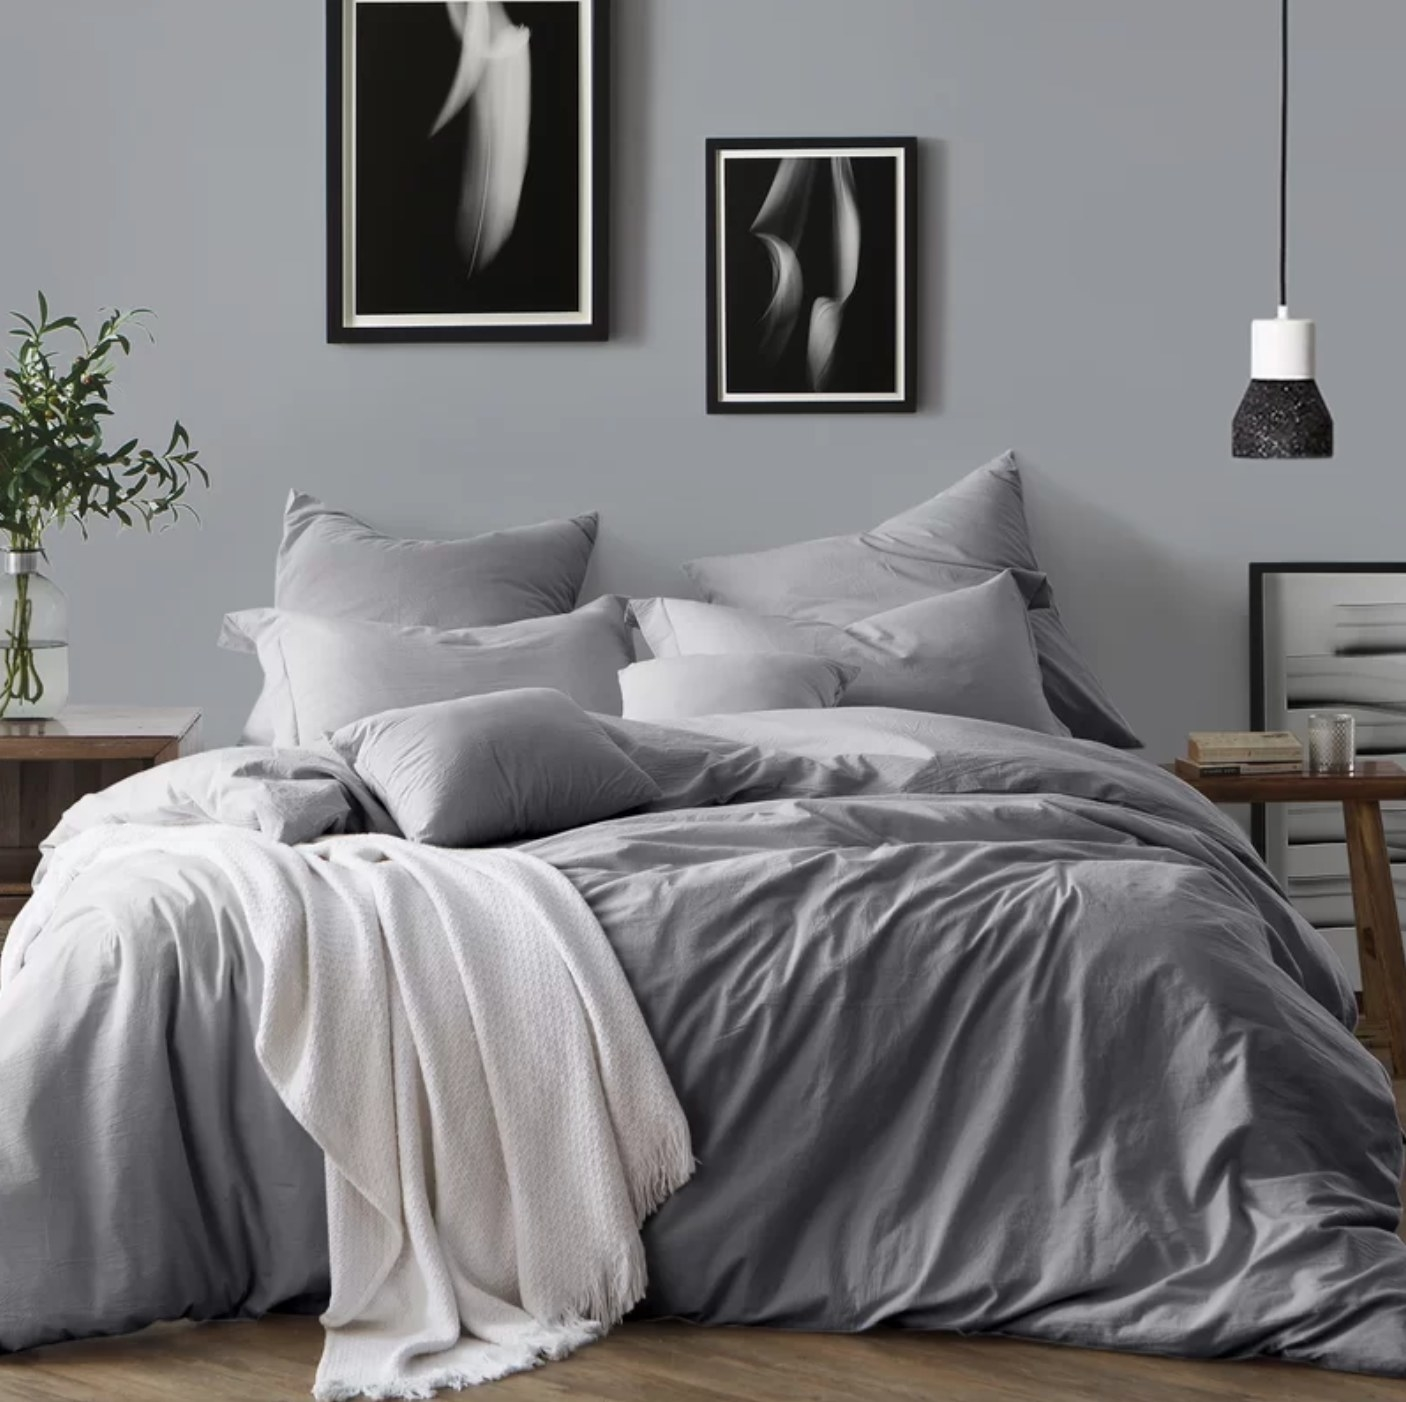 The duvet cover set in ash gray